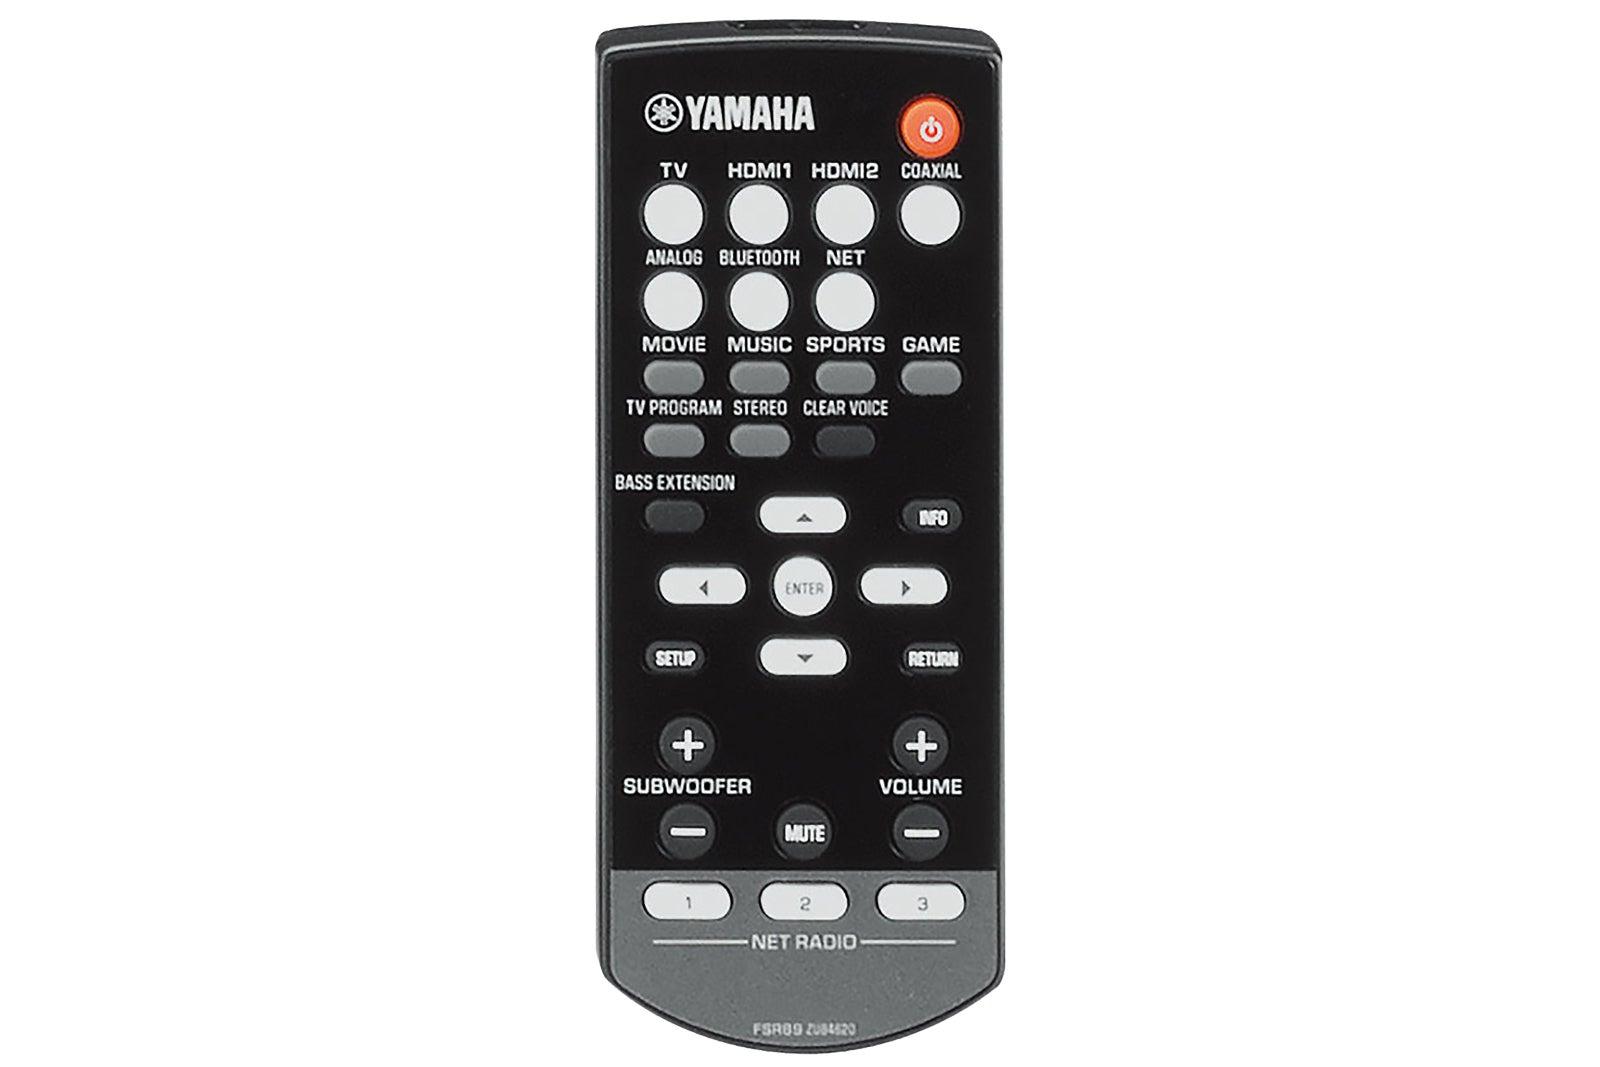 Yamaha yas 706 musiccast soundbar review a perfect for Yamaha remote control app